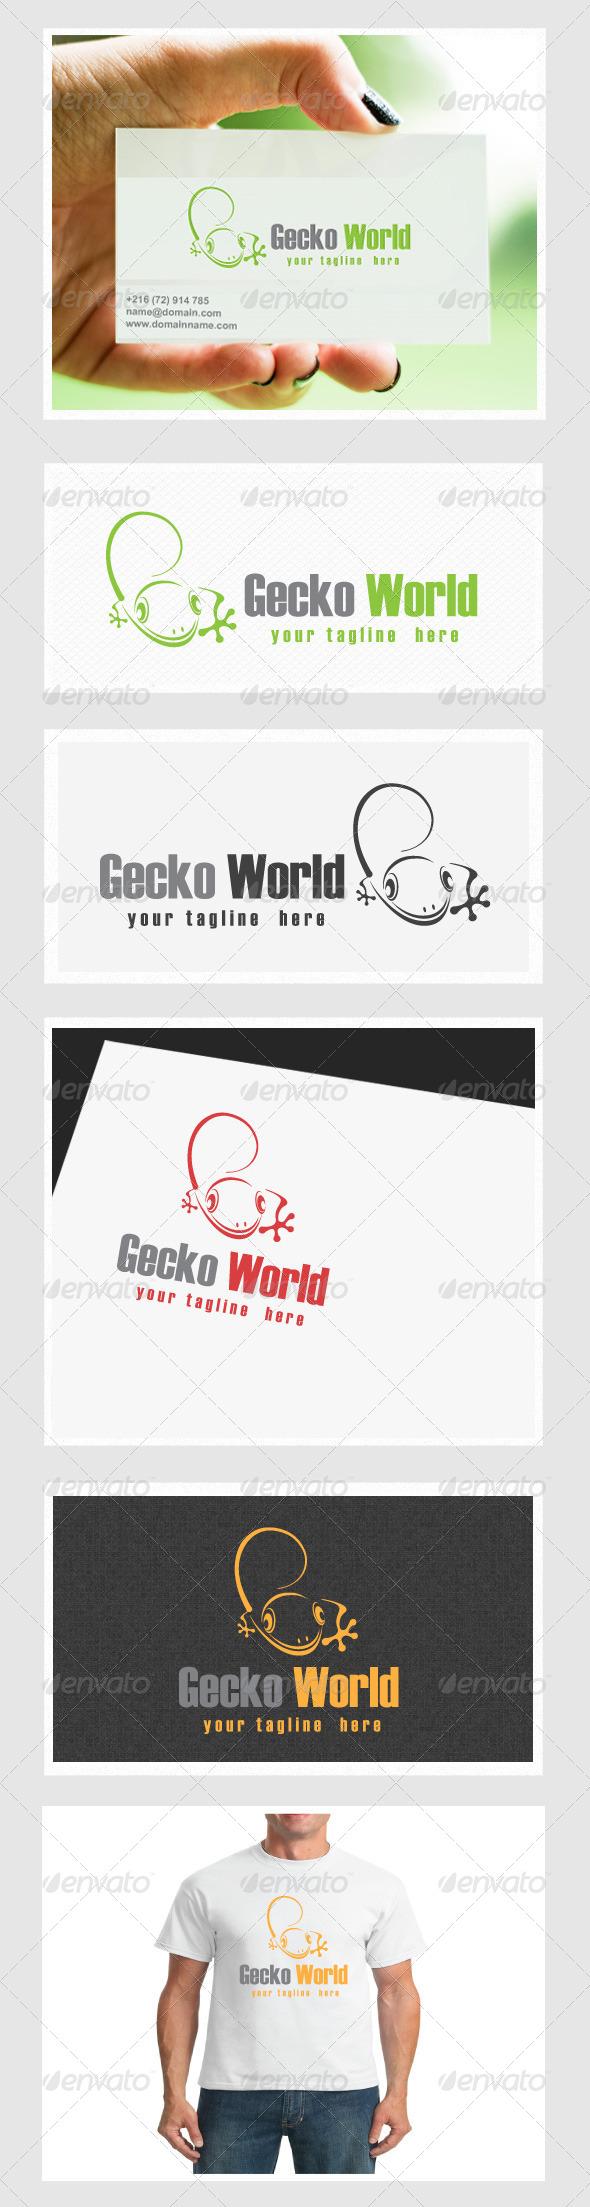 Gecko World - Animals Logo Templates